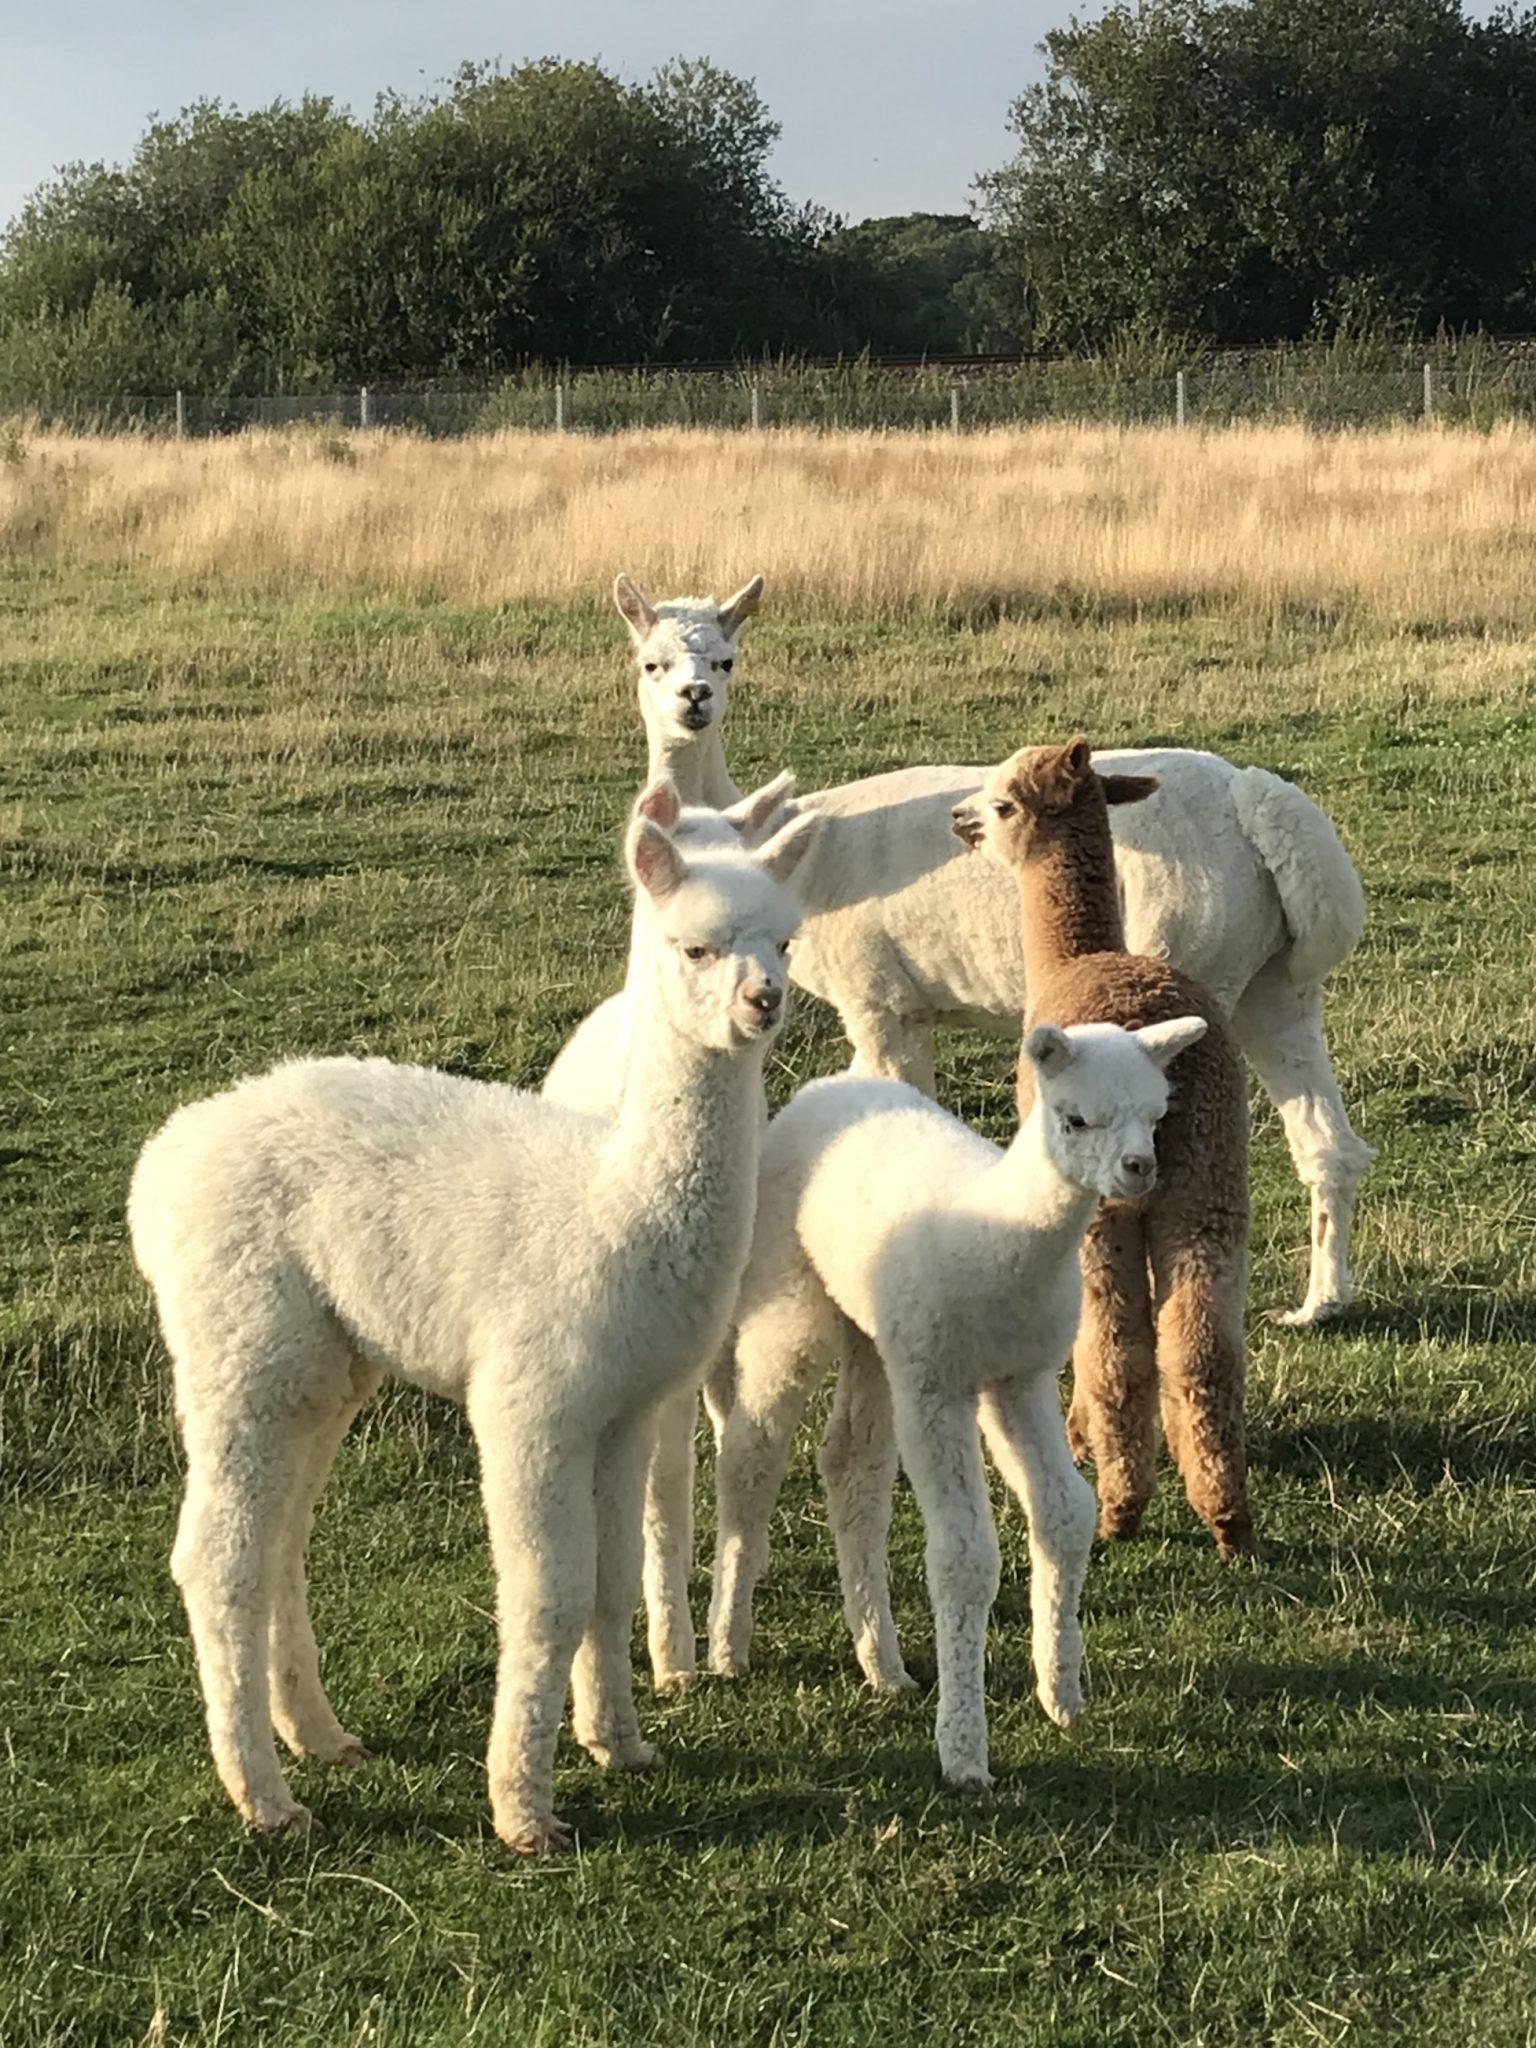 Have you tried Alpaca Yoga yet?